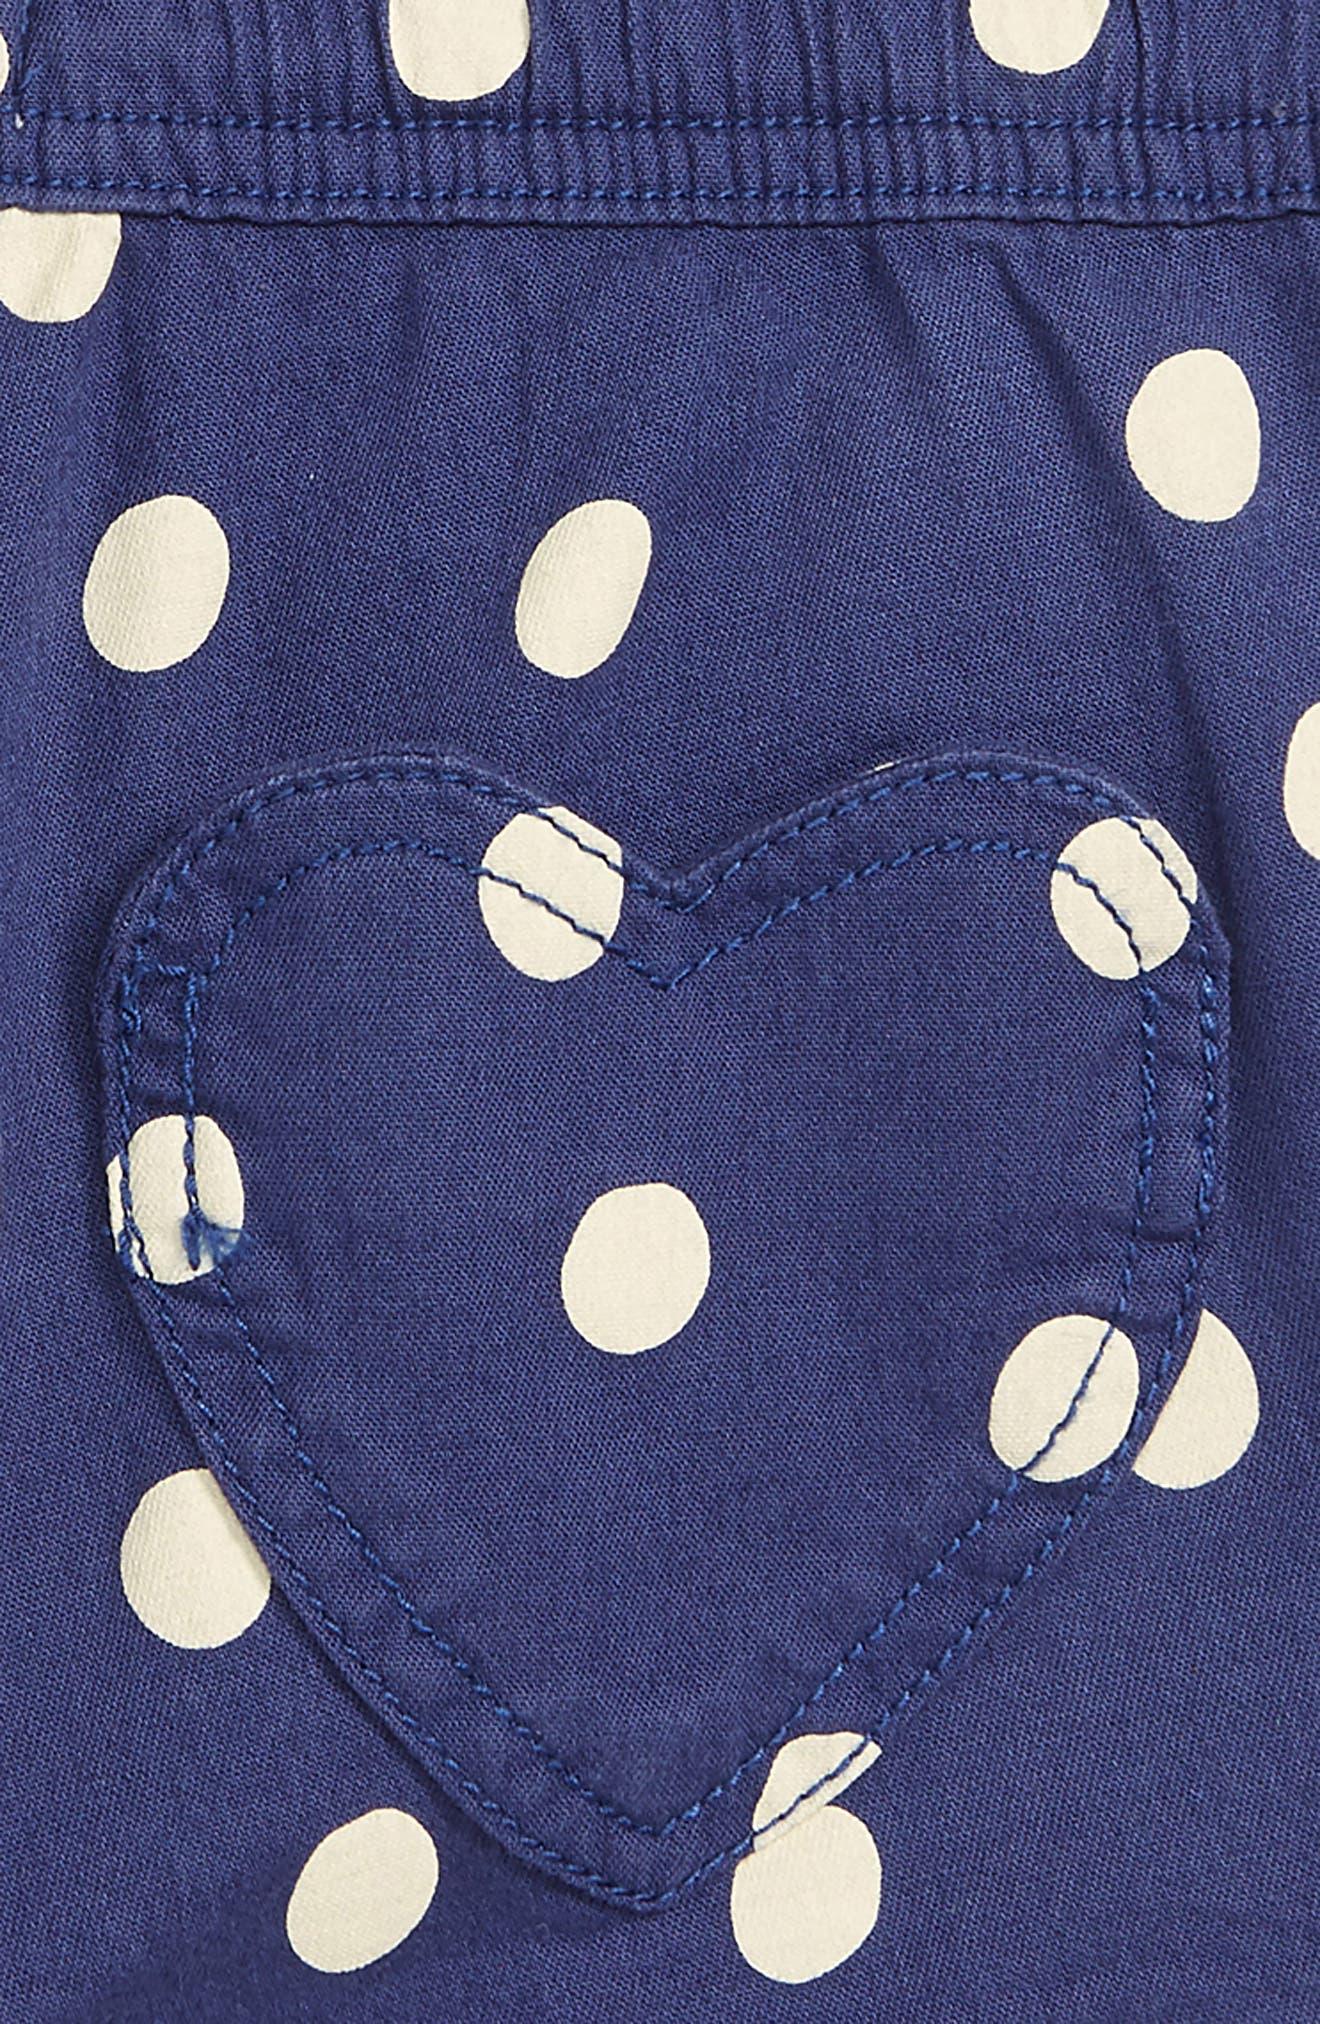 BODEN,                             Heart Pocket Shorts,                             Alternate thumbnail 3, color,                             BLU STARBOARD BLUE/ ECRU SPOT